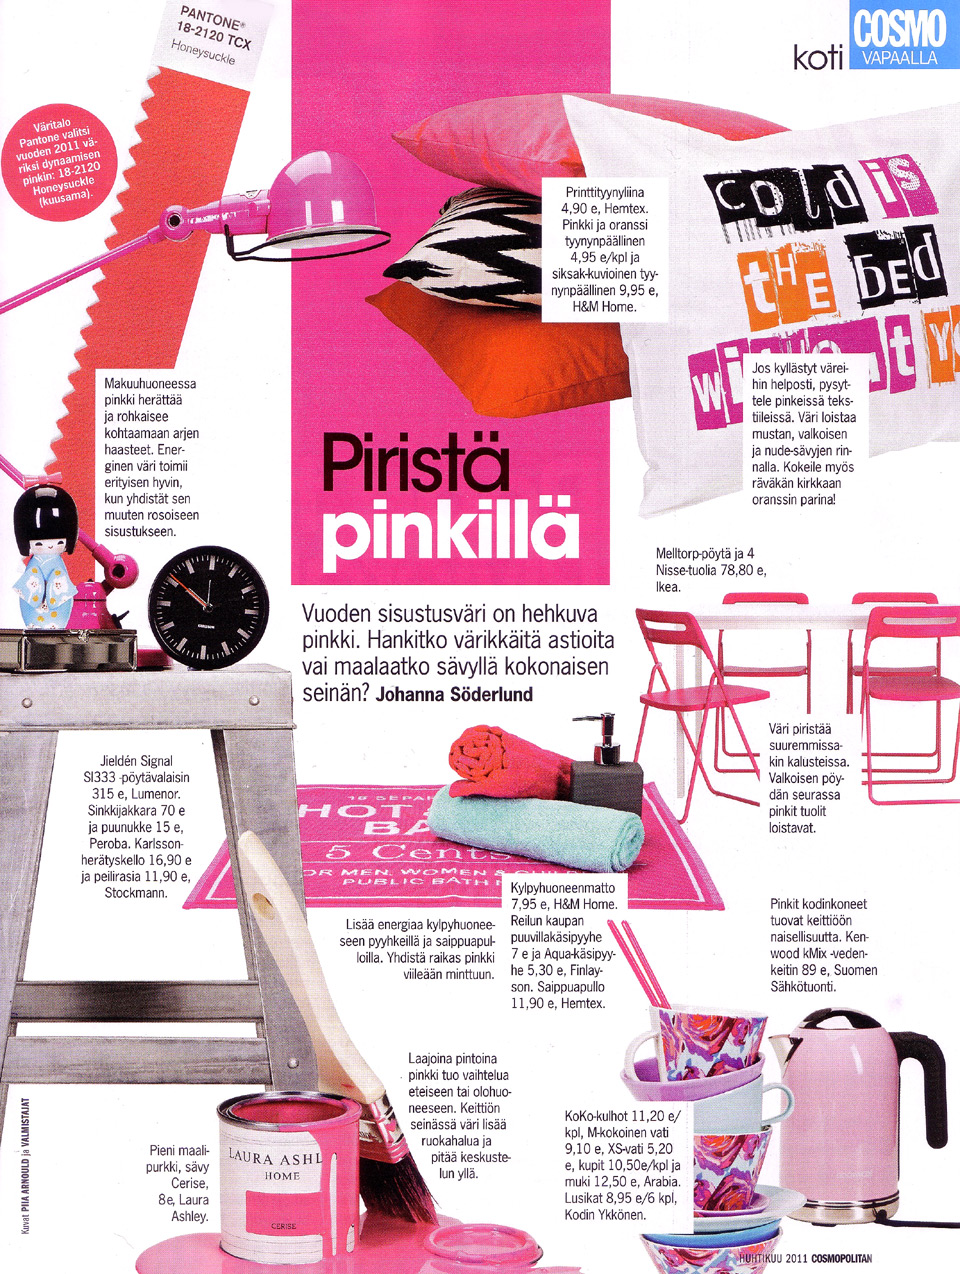 Cosmopolitan huhtikuu 2011